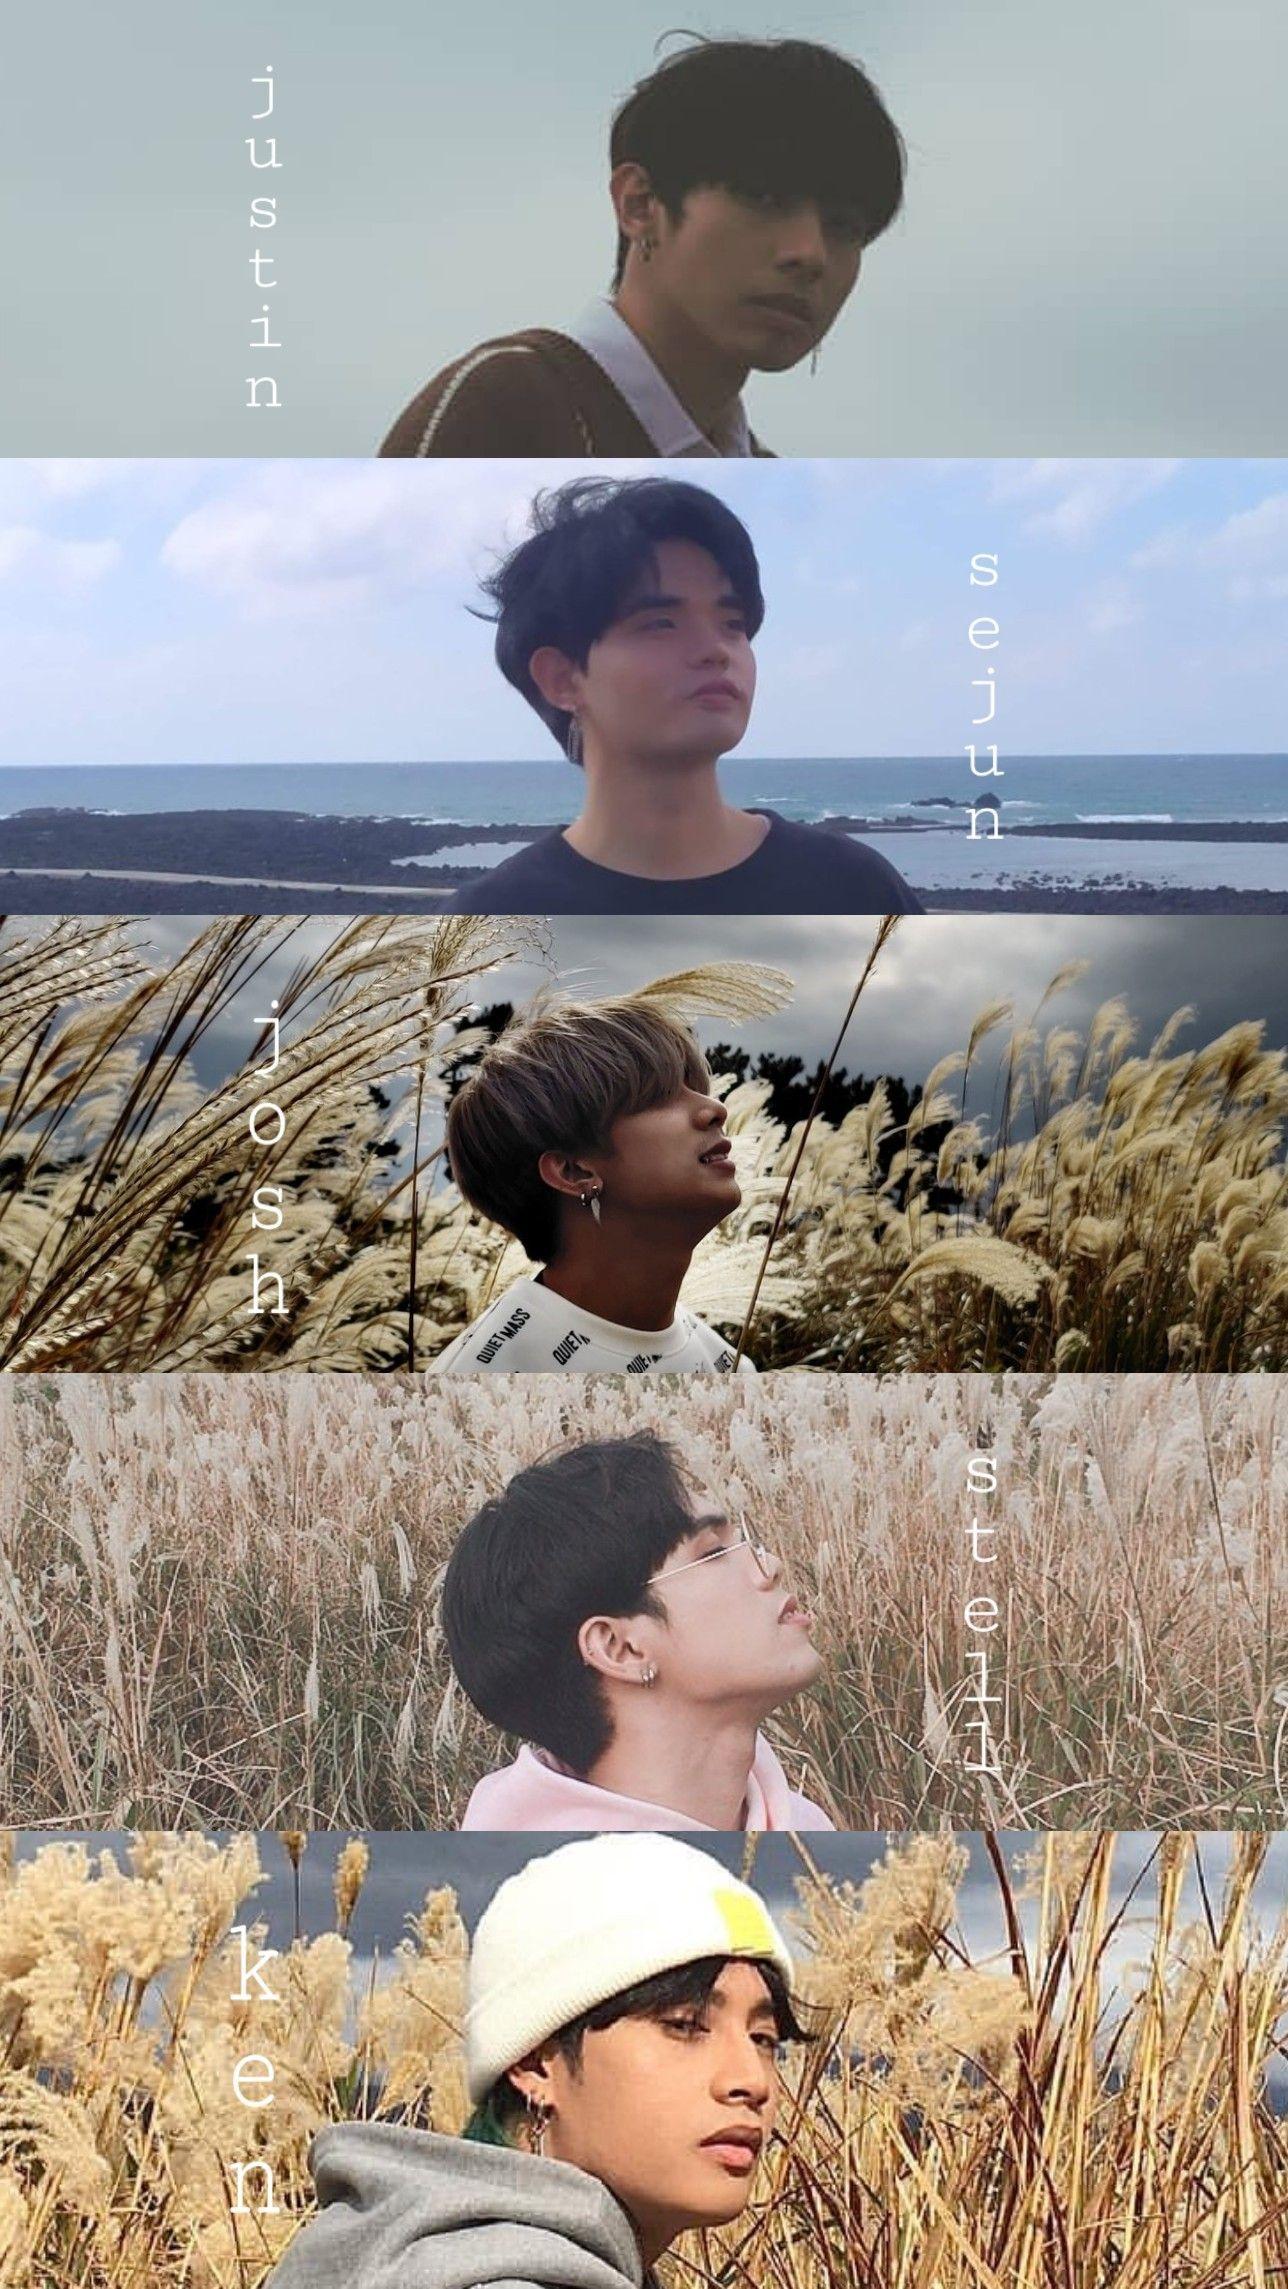 Sb19 Justin Sb19justin Sb19 Justin With Images Korean